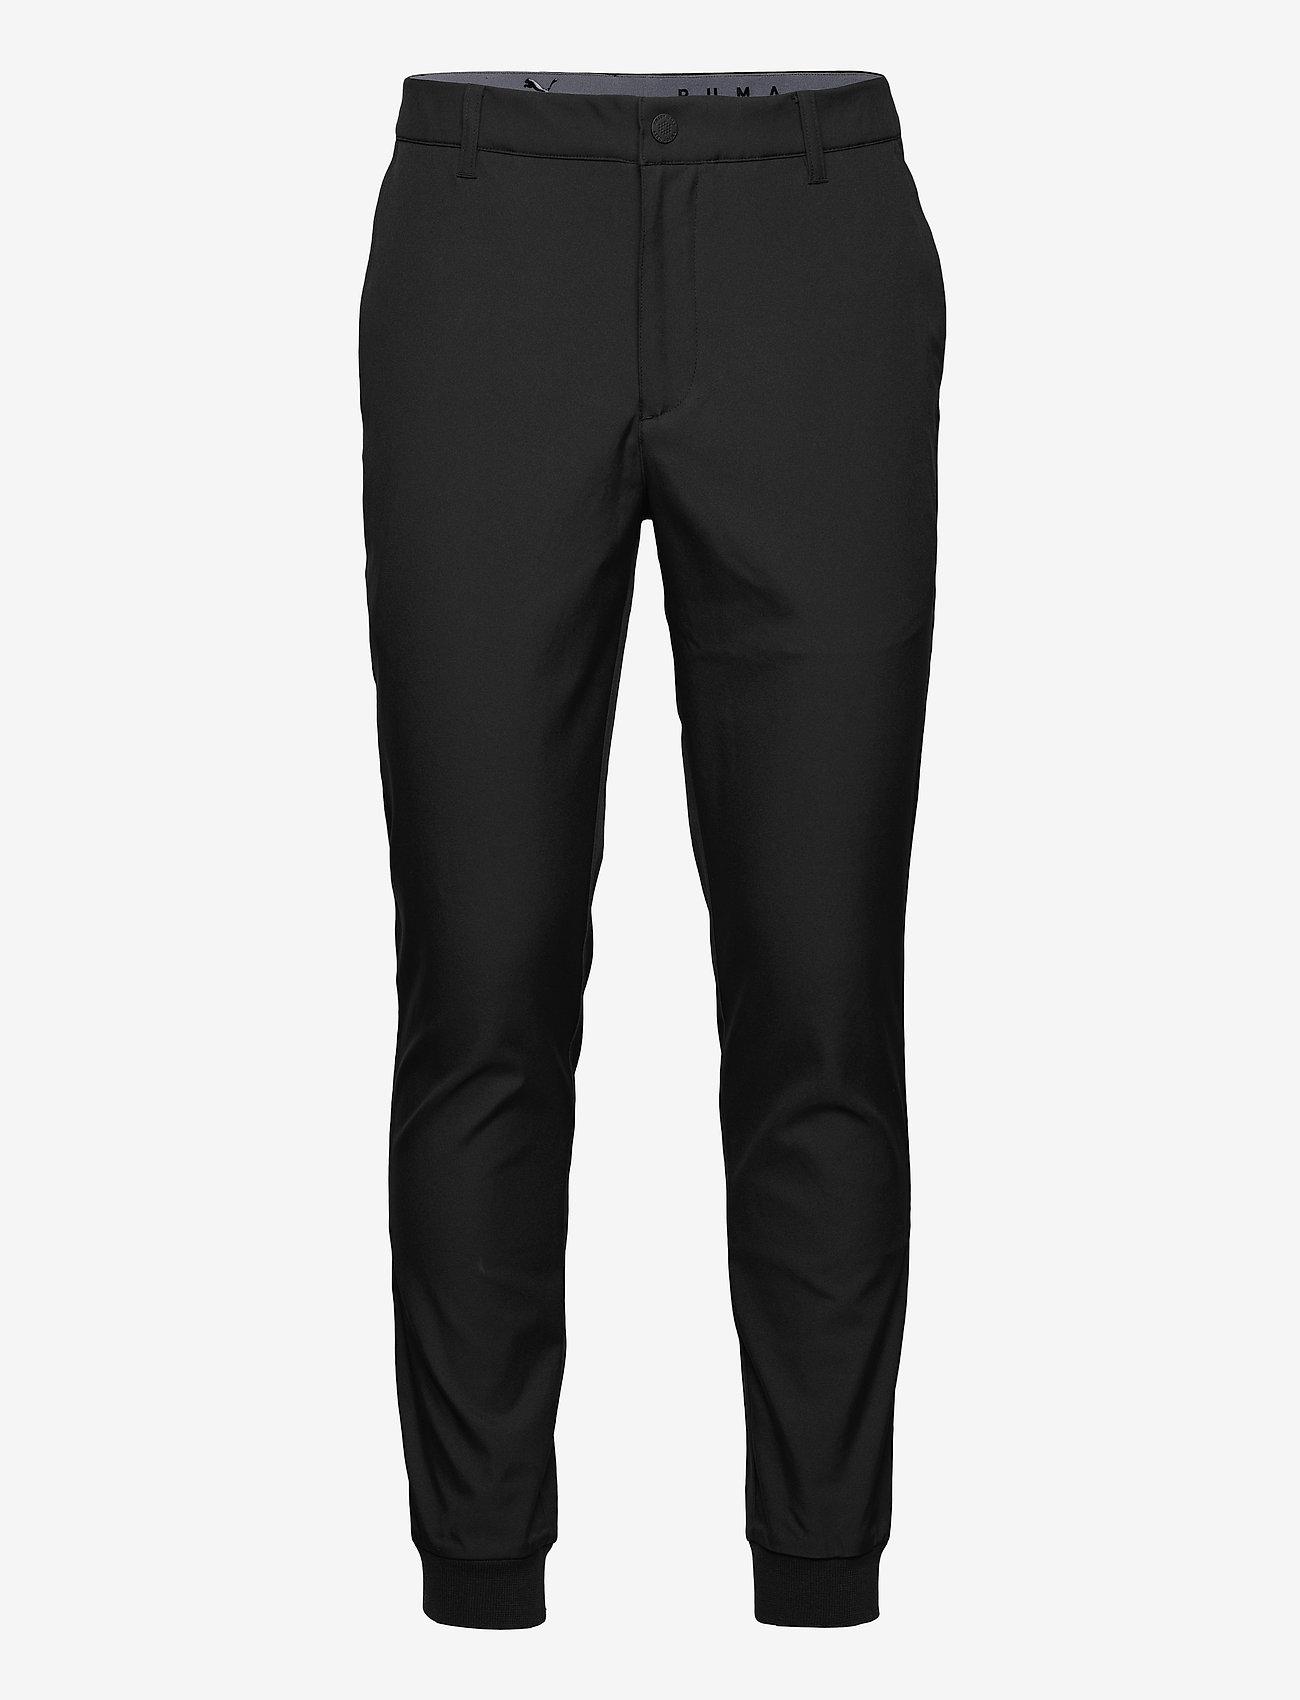 PUMA Golf - Jackpot Jogger - golf pants - puma black - 0